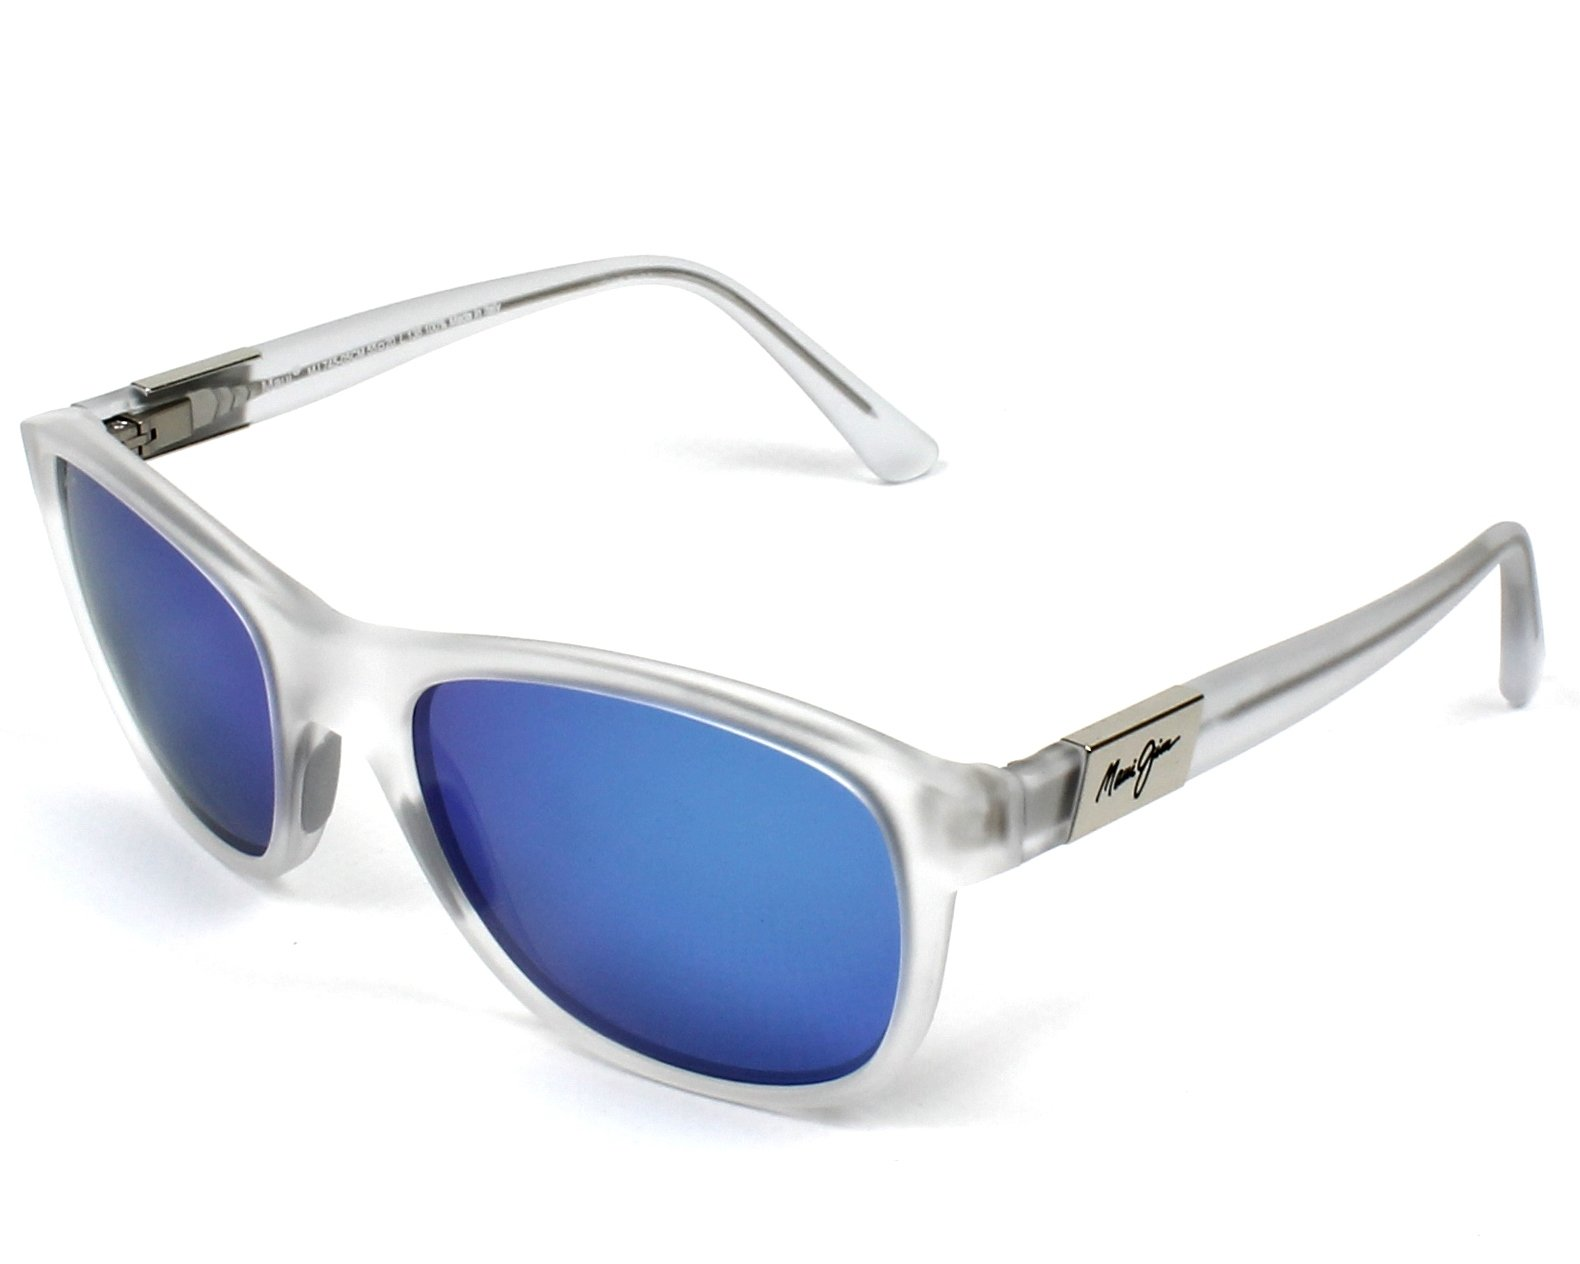 67fa6bf5c55 Polarized. Sunglasses Maui Jim B-745 05CM 55-20 Crystal Crystal profile view